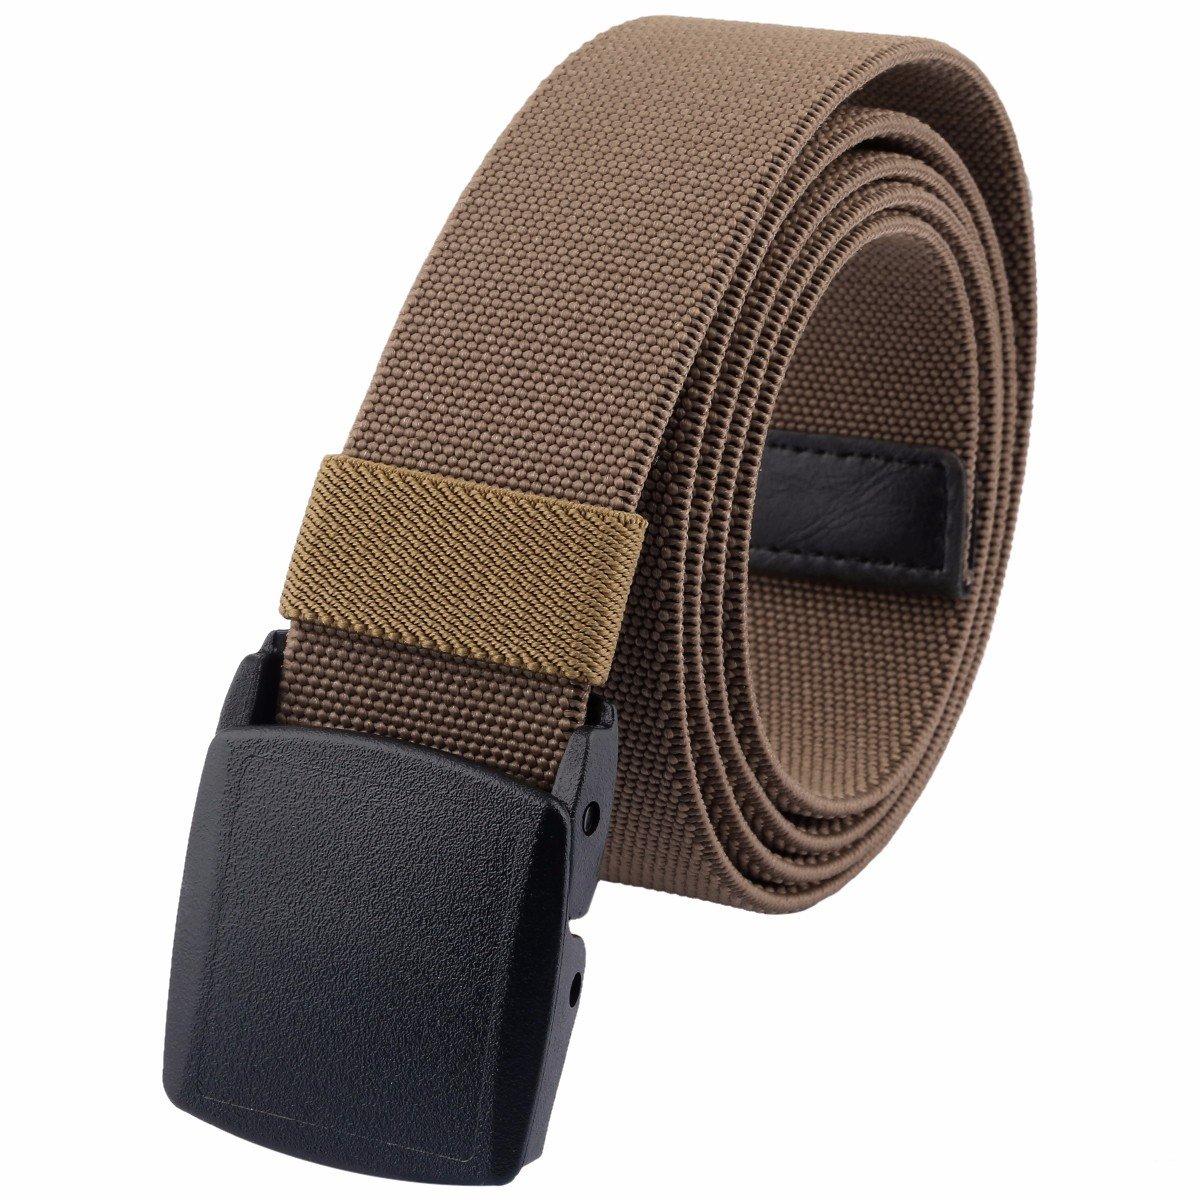 moonsix Men's Elastic Belt,Outdoor Military Tactical Duty Web Belt with Plastic Buckle,Khaki